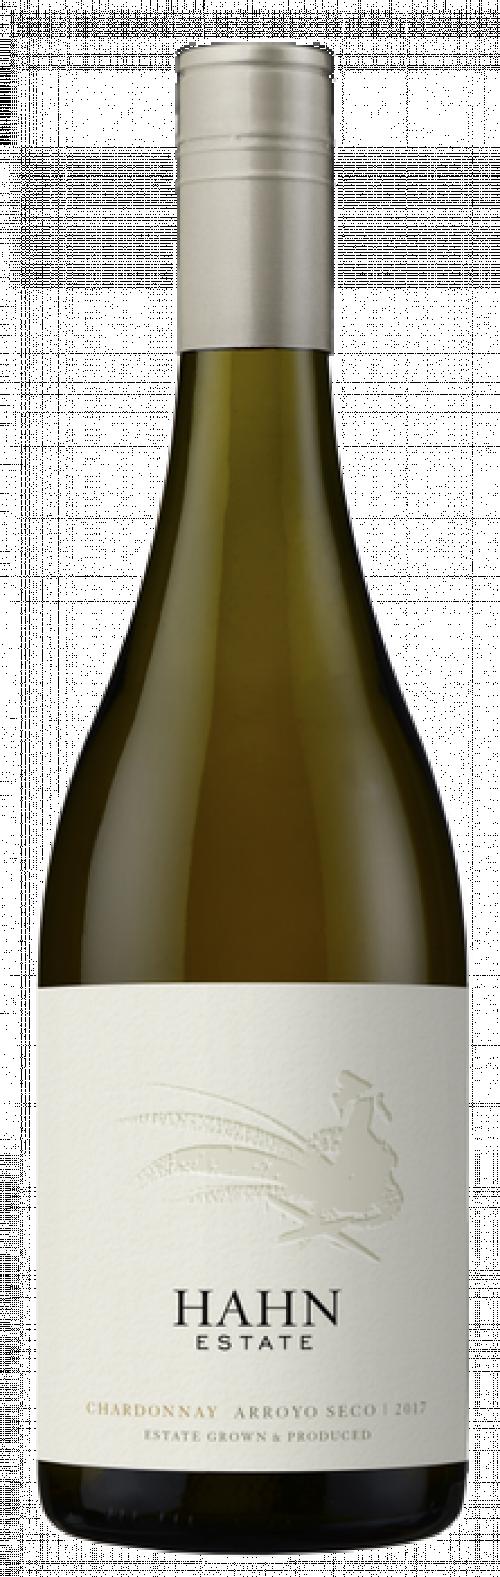 2019 Hahn Estates Chardonnay 750ml